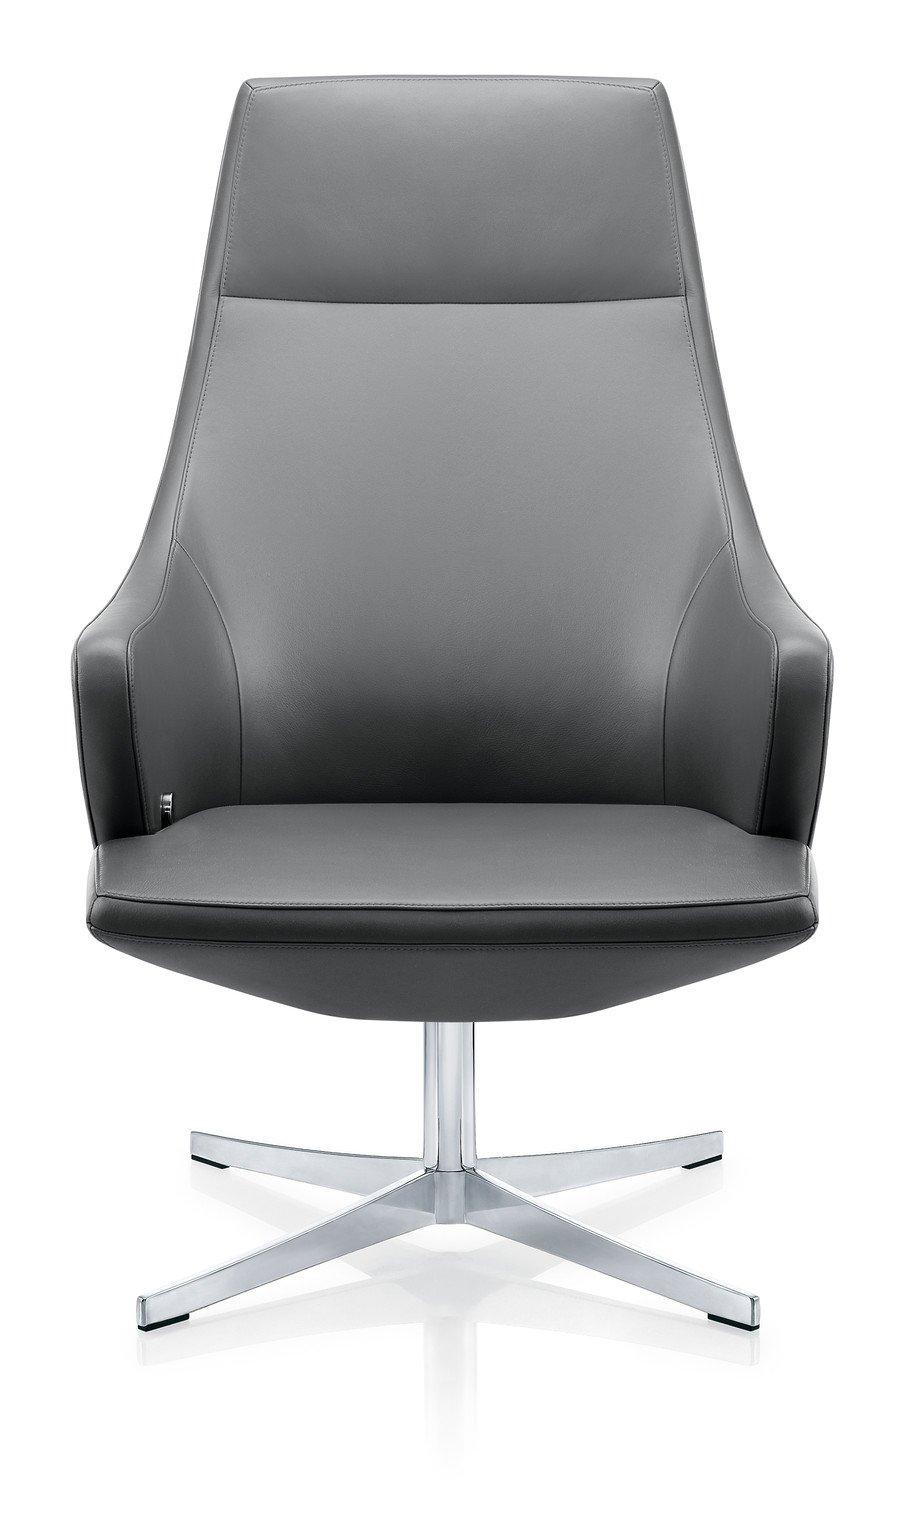 Zuco 4+ Relax AA 086 loungestoel  AA 086 1